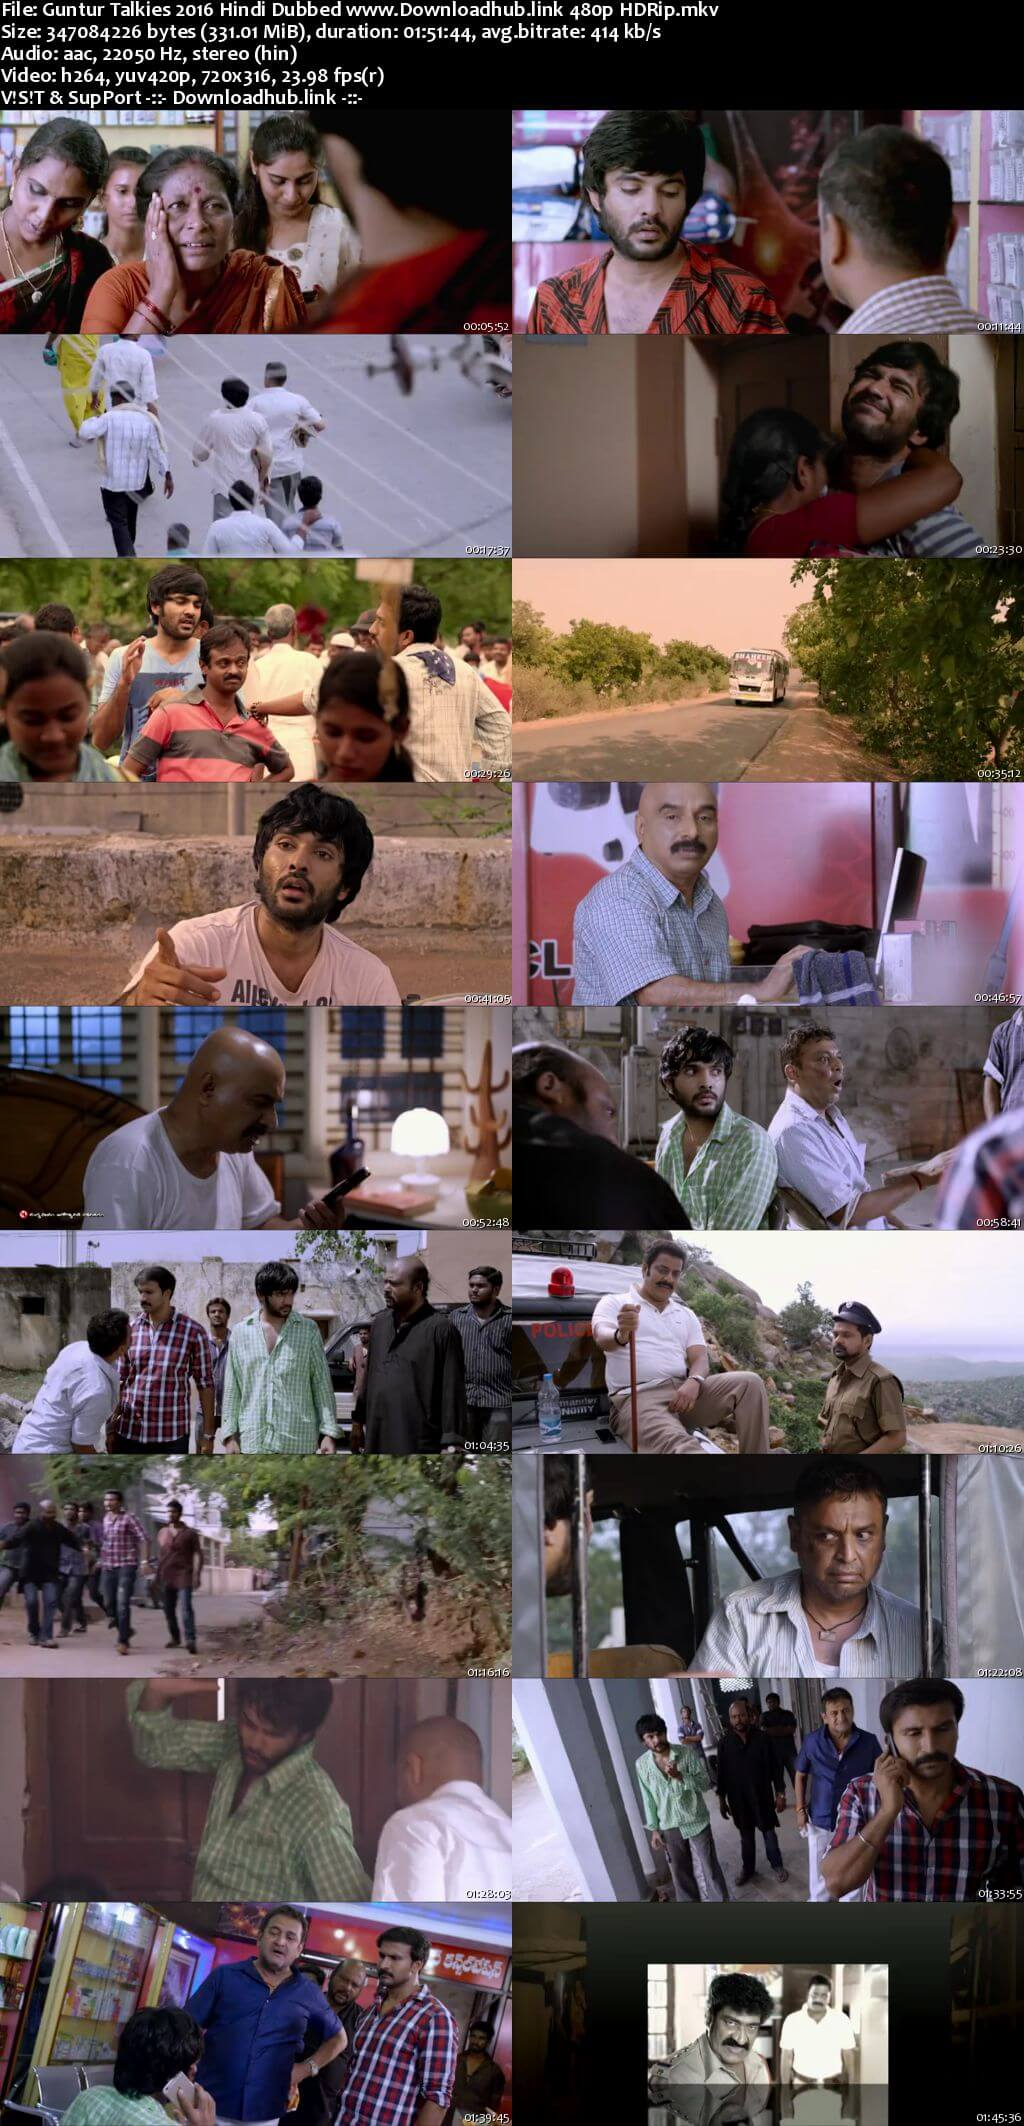 Guntur Talkies 2016 Hindi Dubbed 300MB HDRip 480p